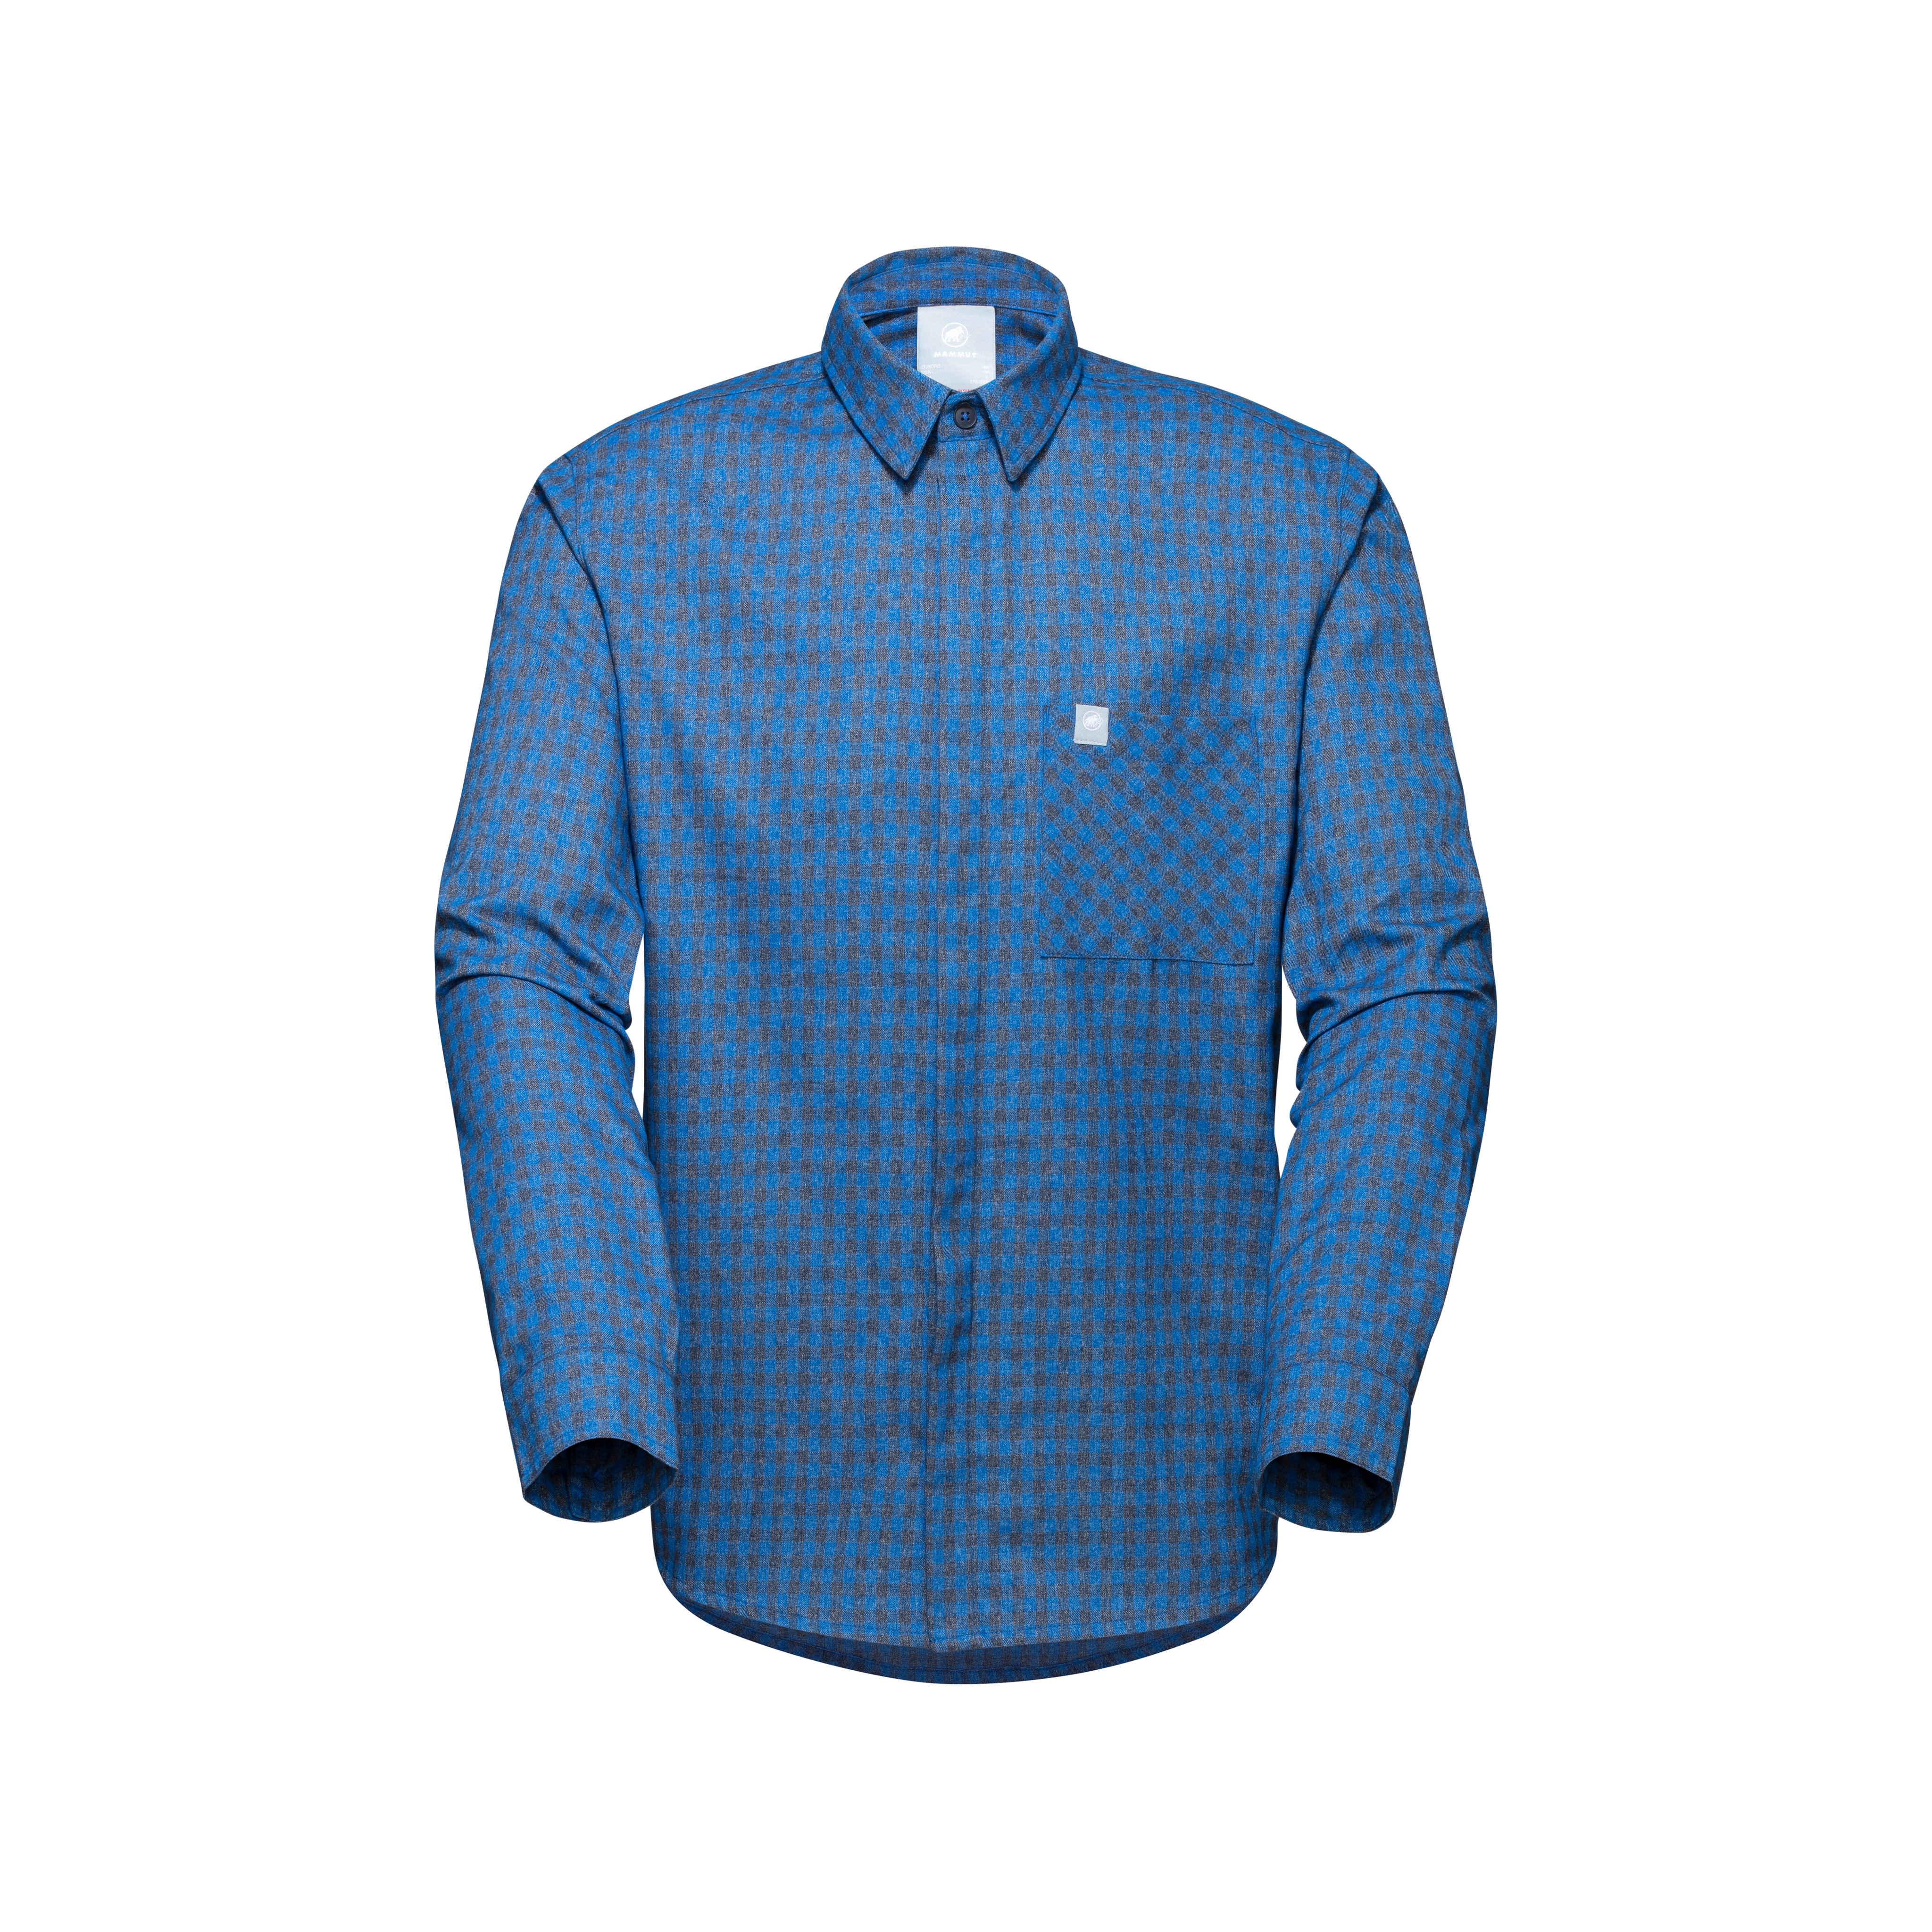 Winter Longsleeve Shirt Men - ice-marine, S thumbnail